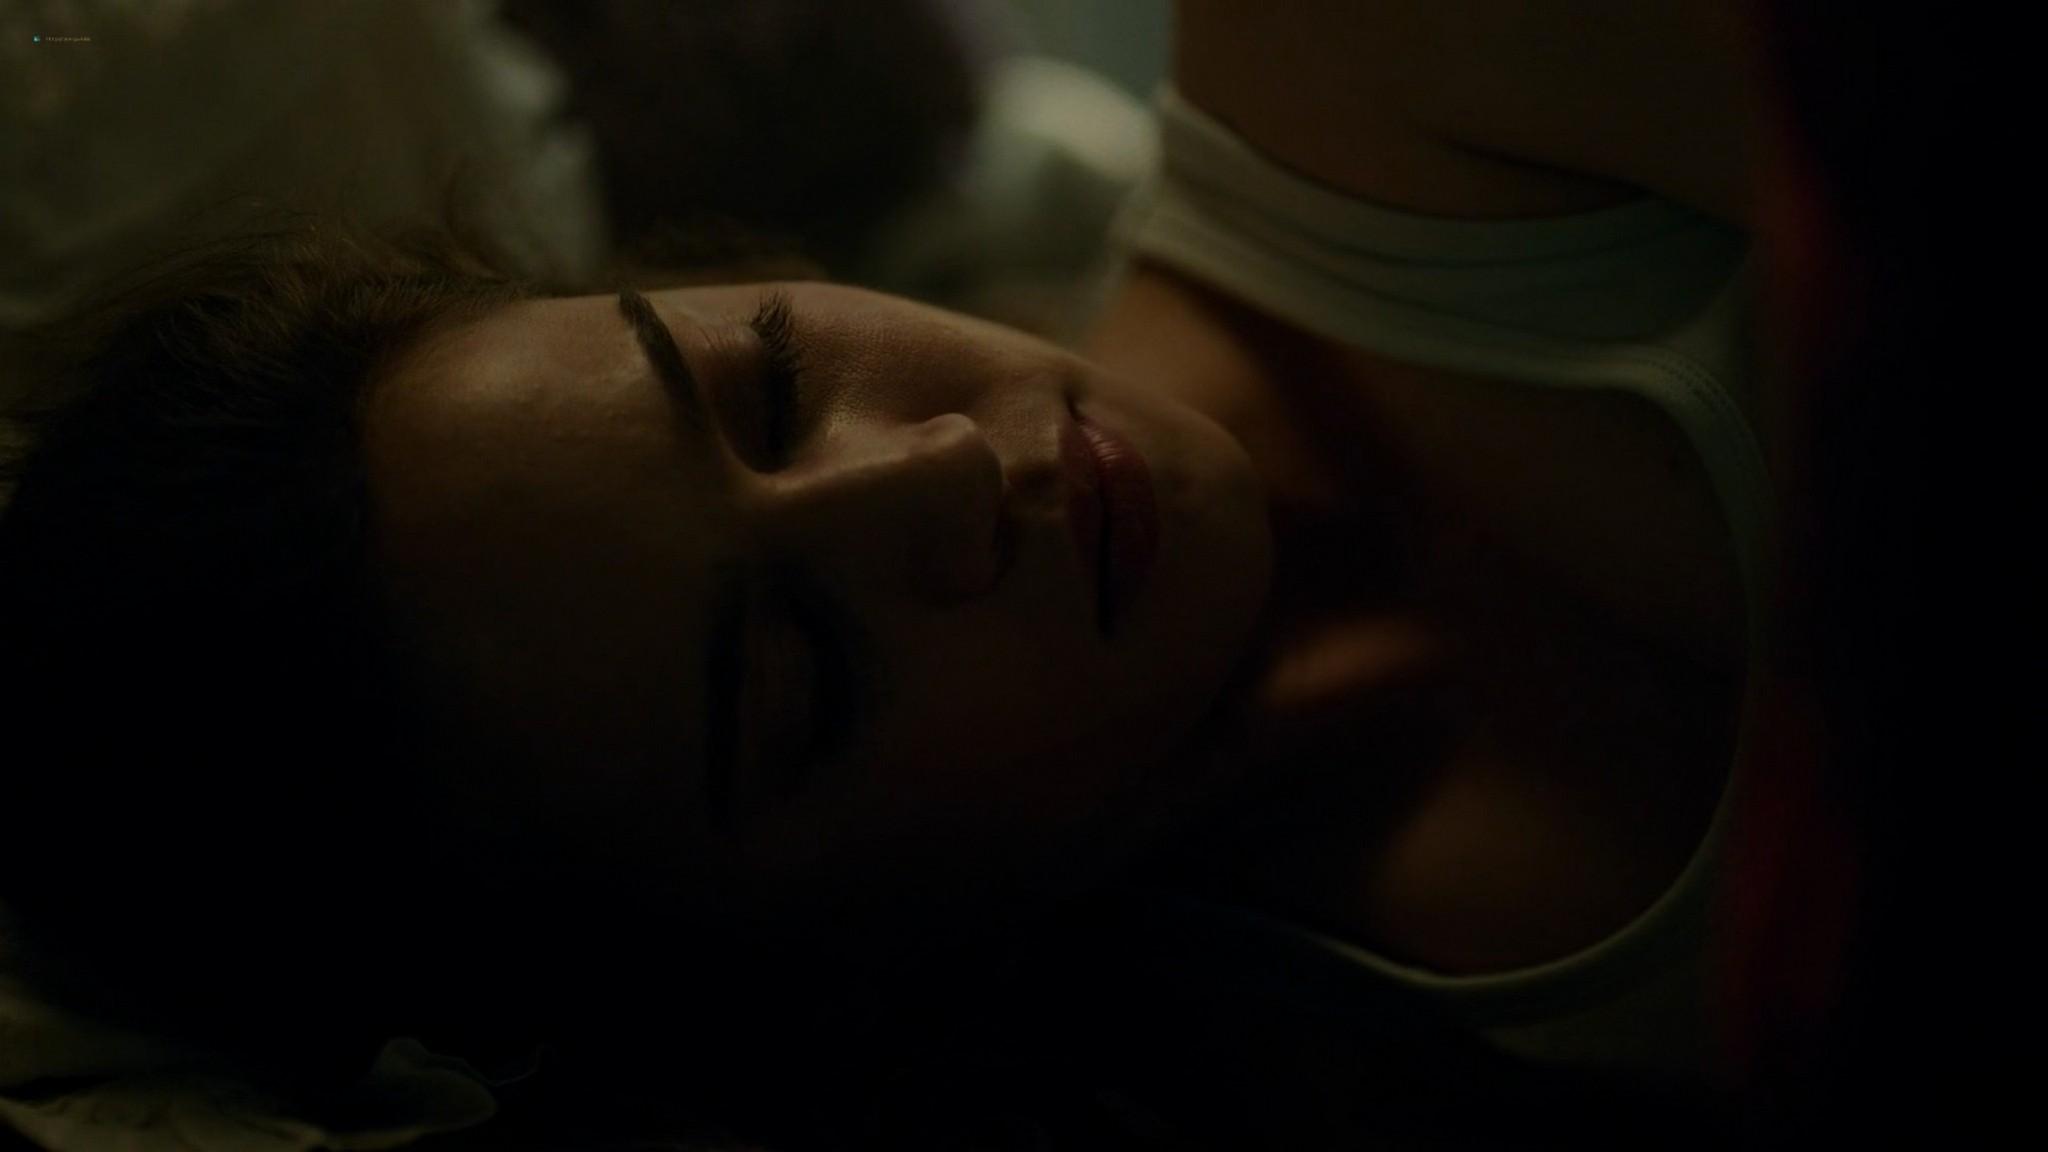 Matilda Anna Ingrid Lutz hot and sexy Rings 2017 1080p BluRay 9